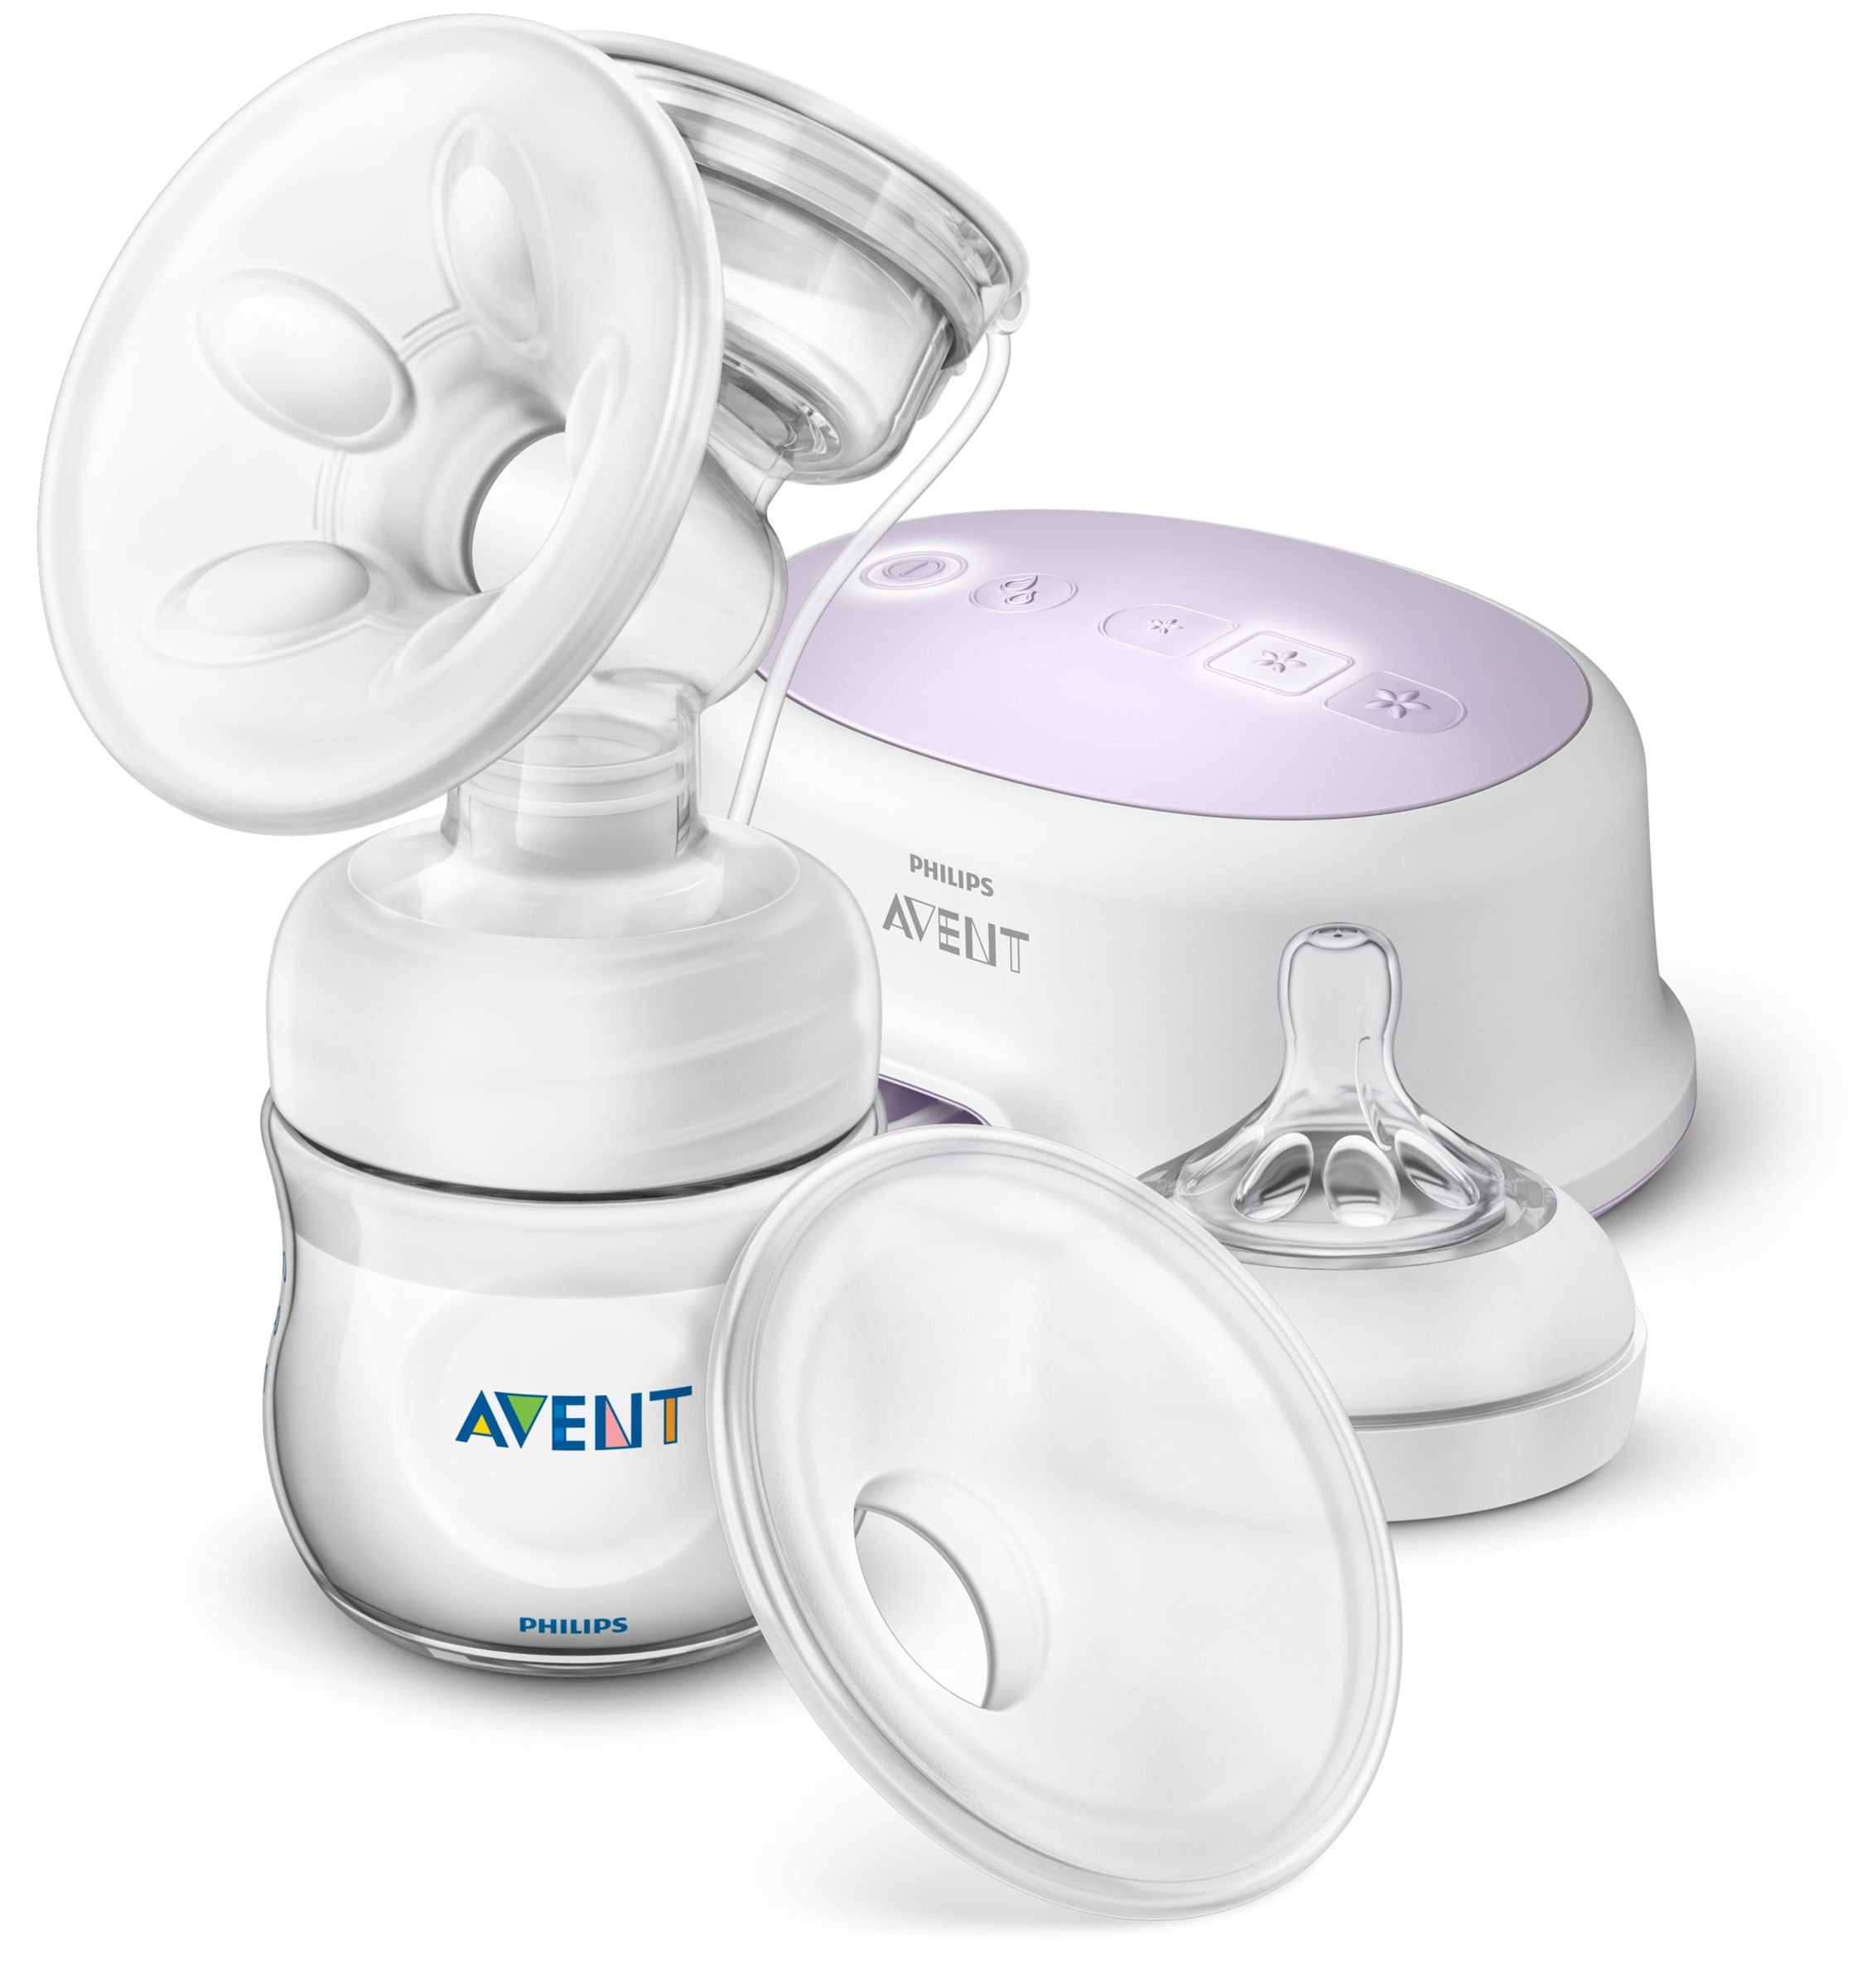 Philips Avent Ultra Comfort Single Electric Breast Pump Scf332 61